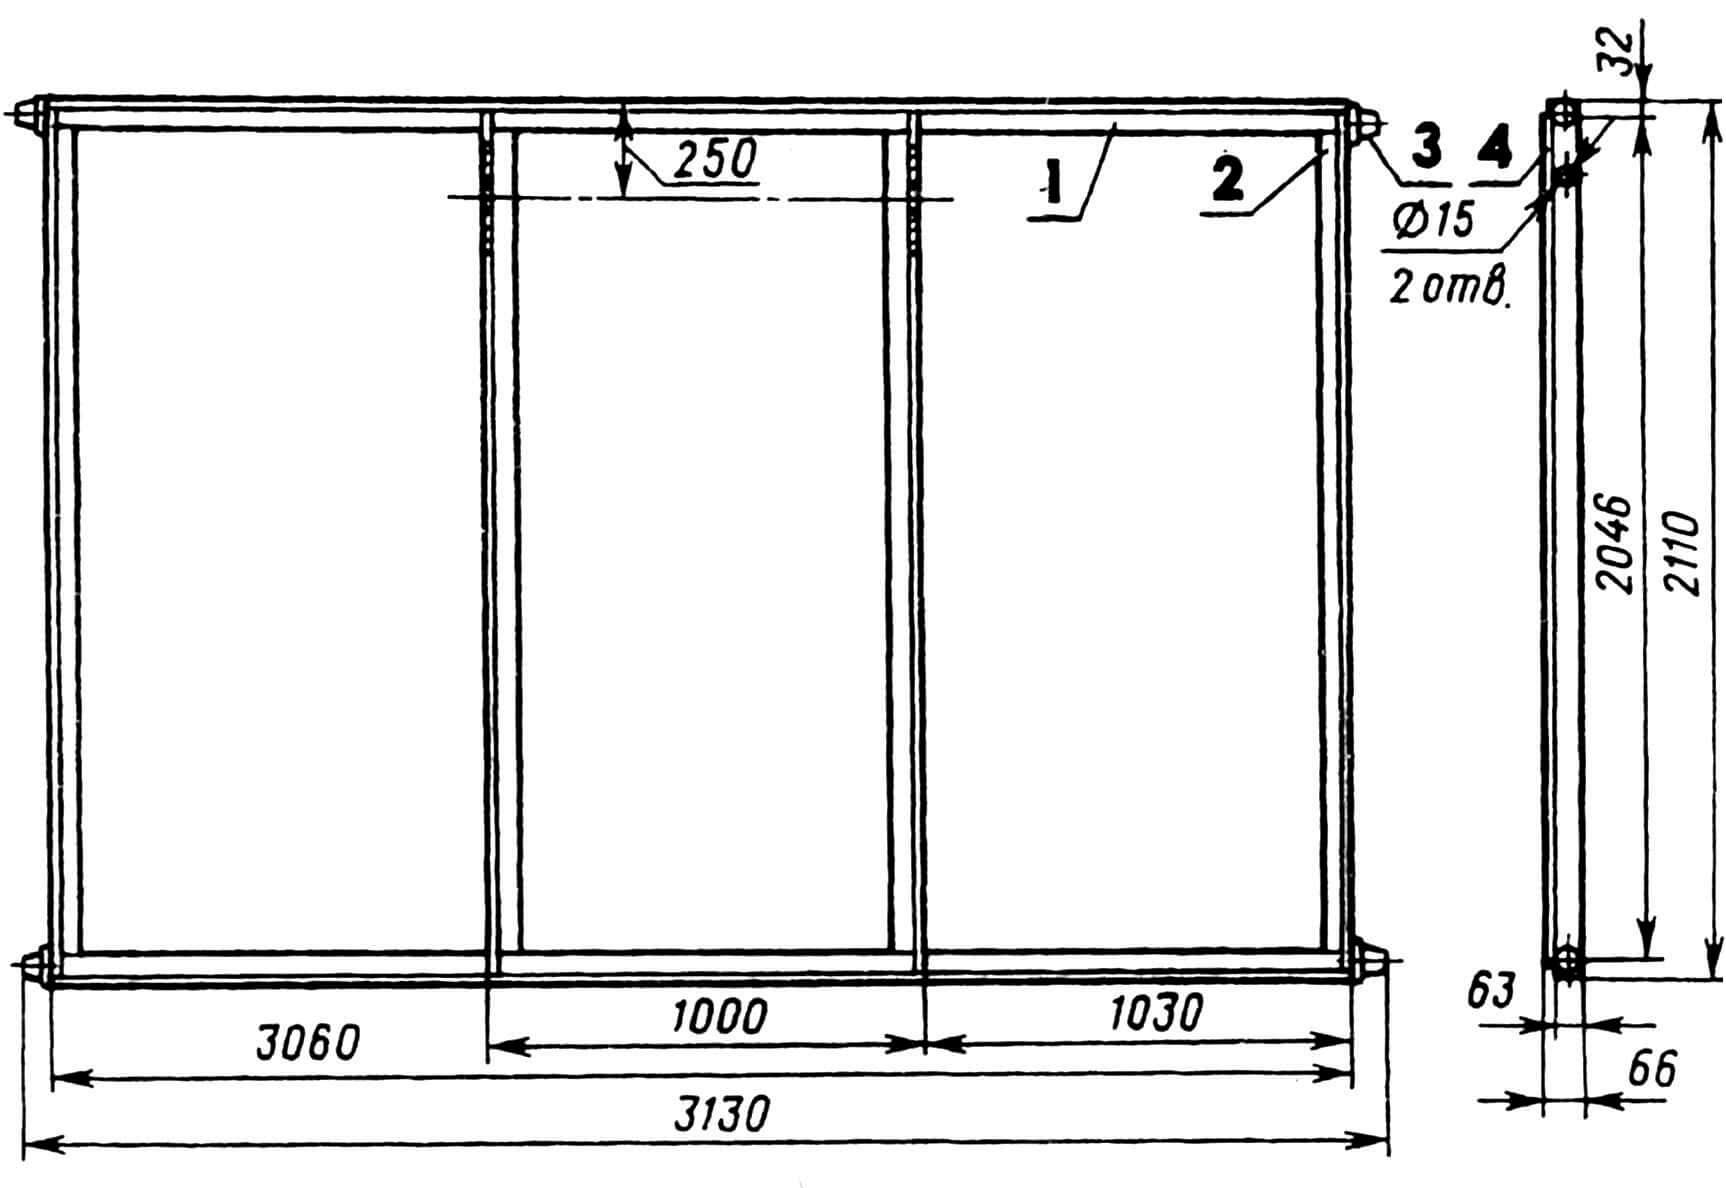 Створка ворот: 1 — поперечник (уголок 63x63x6, 2 шт.), 2 — стойка (уголок 63x63x6, 4 шт.), 3 — ролик (4 шт.), 4 — обшивка (лист s3).